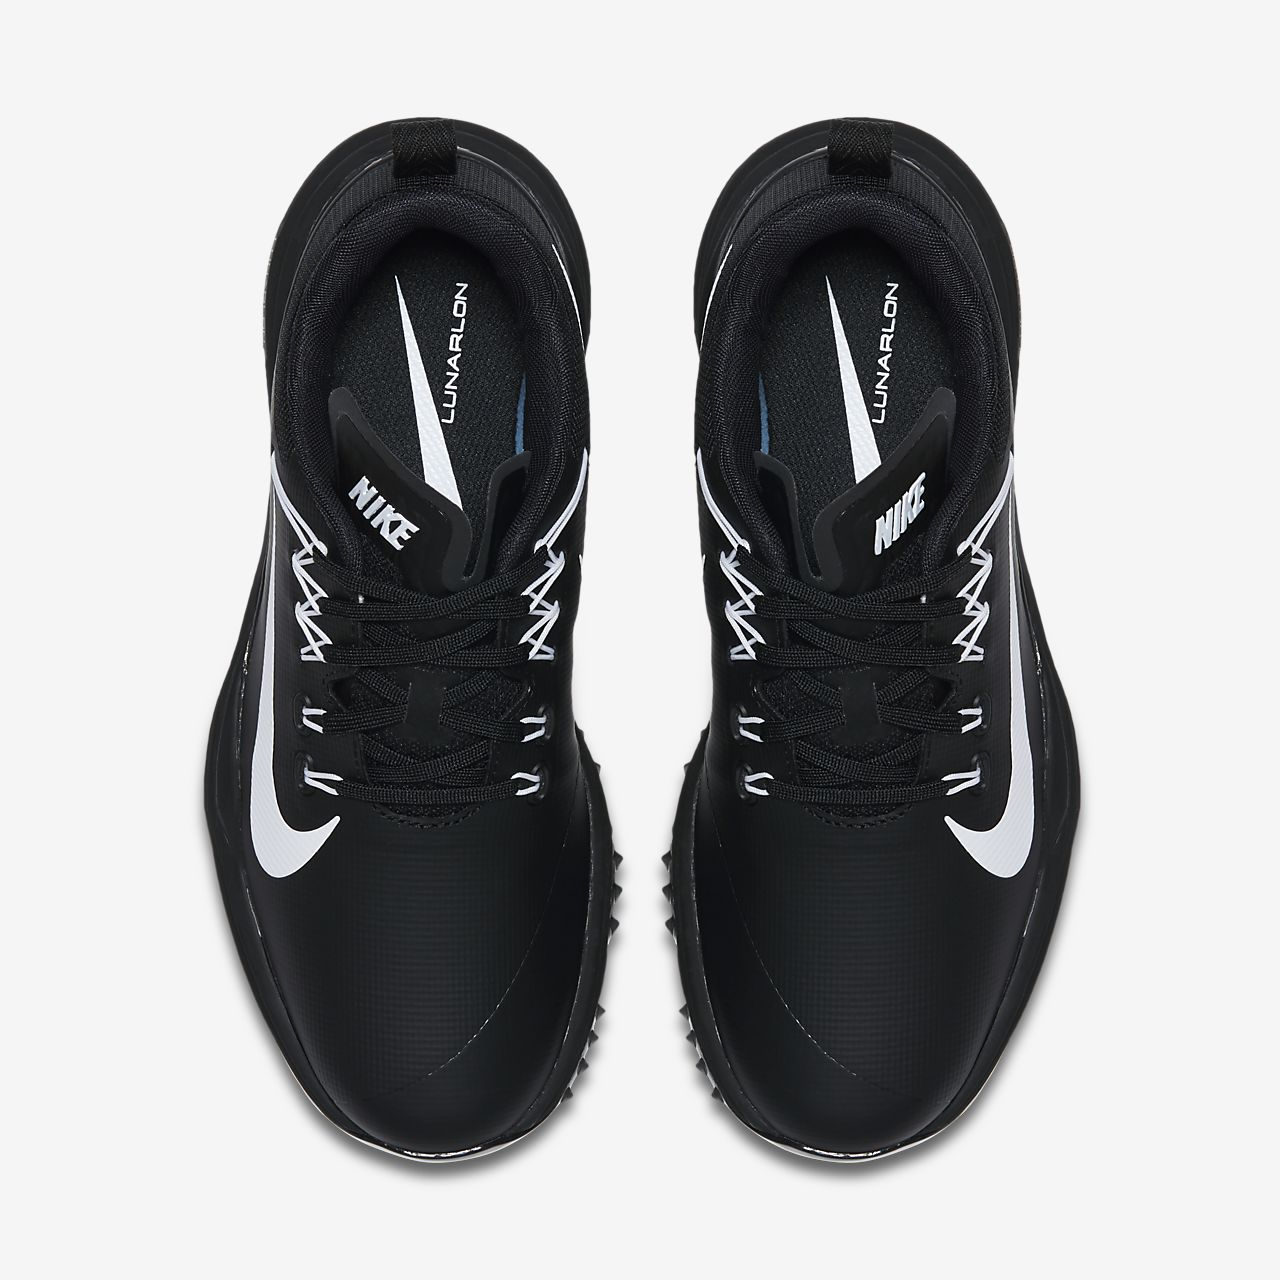 cebe0aa642d1 Nike Lunar Command 2 Women s Golf Shoe. Nike.com IE